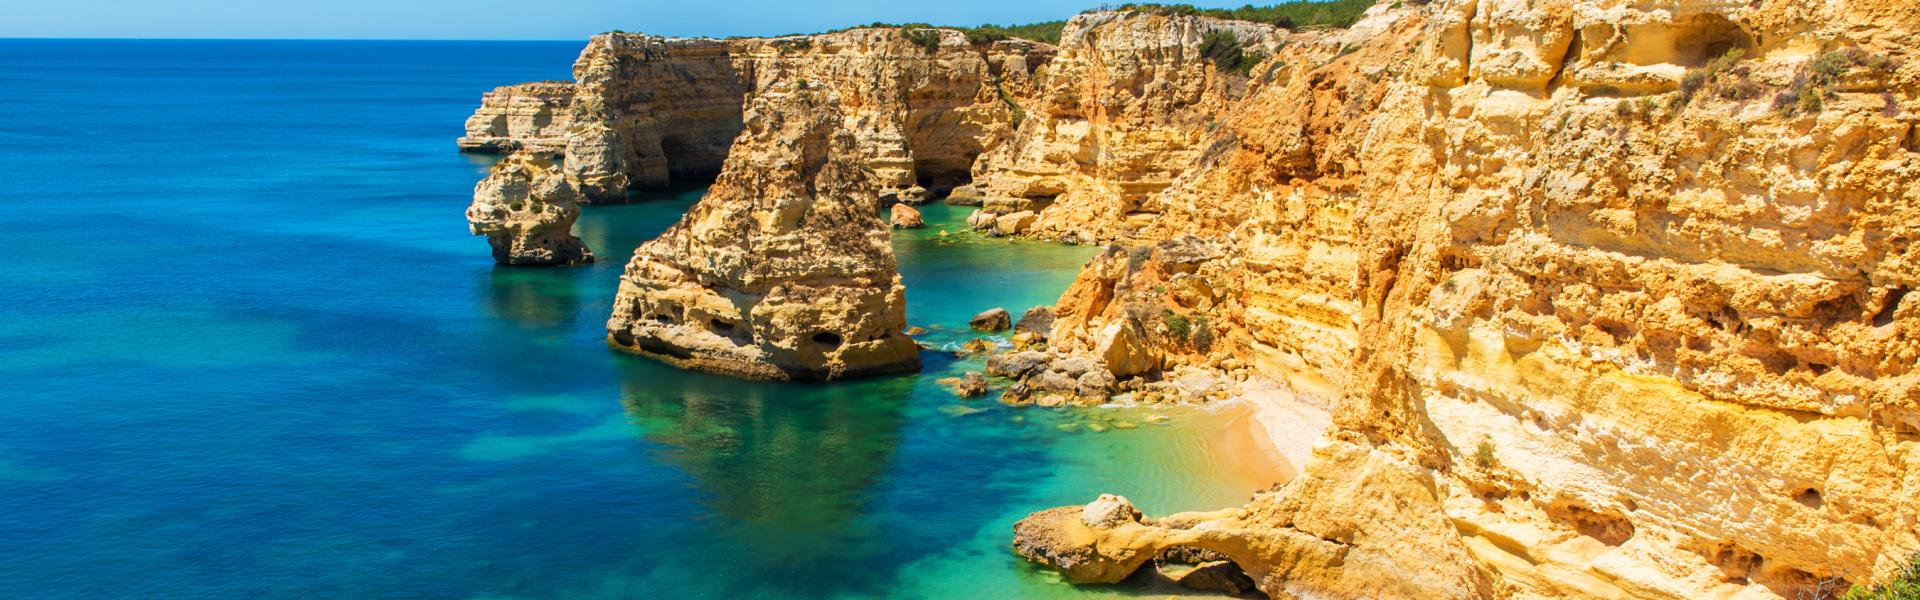 Flughafen Algarve Karte.Flug Algarve Flüge Billigflüge Nach Algarve Günstig Online Buchen